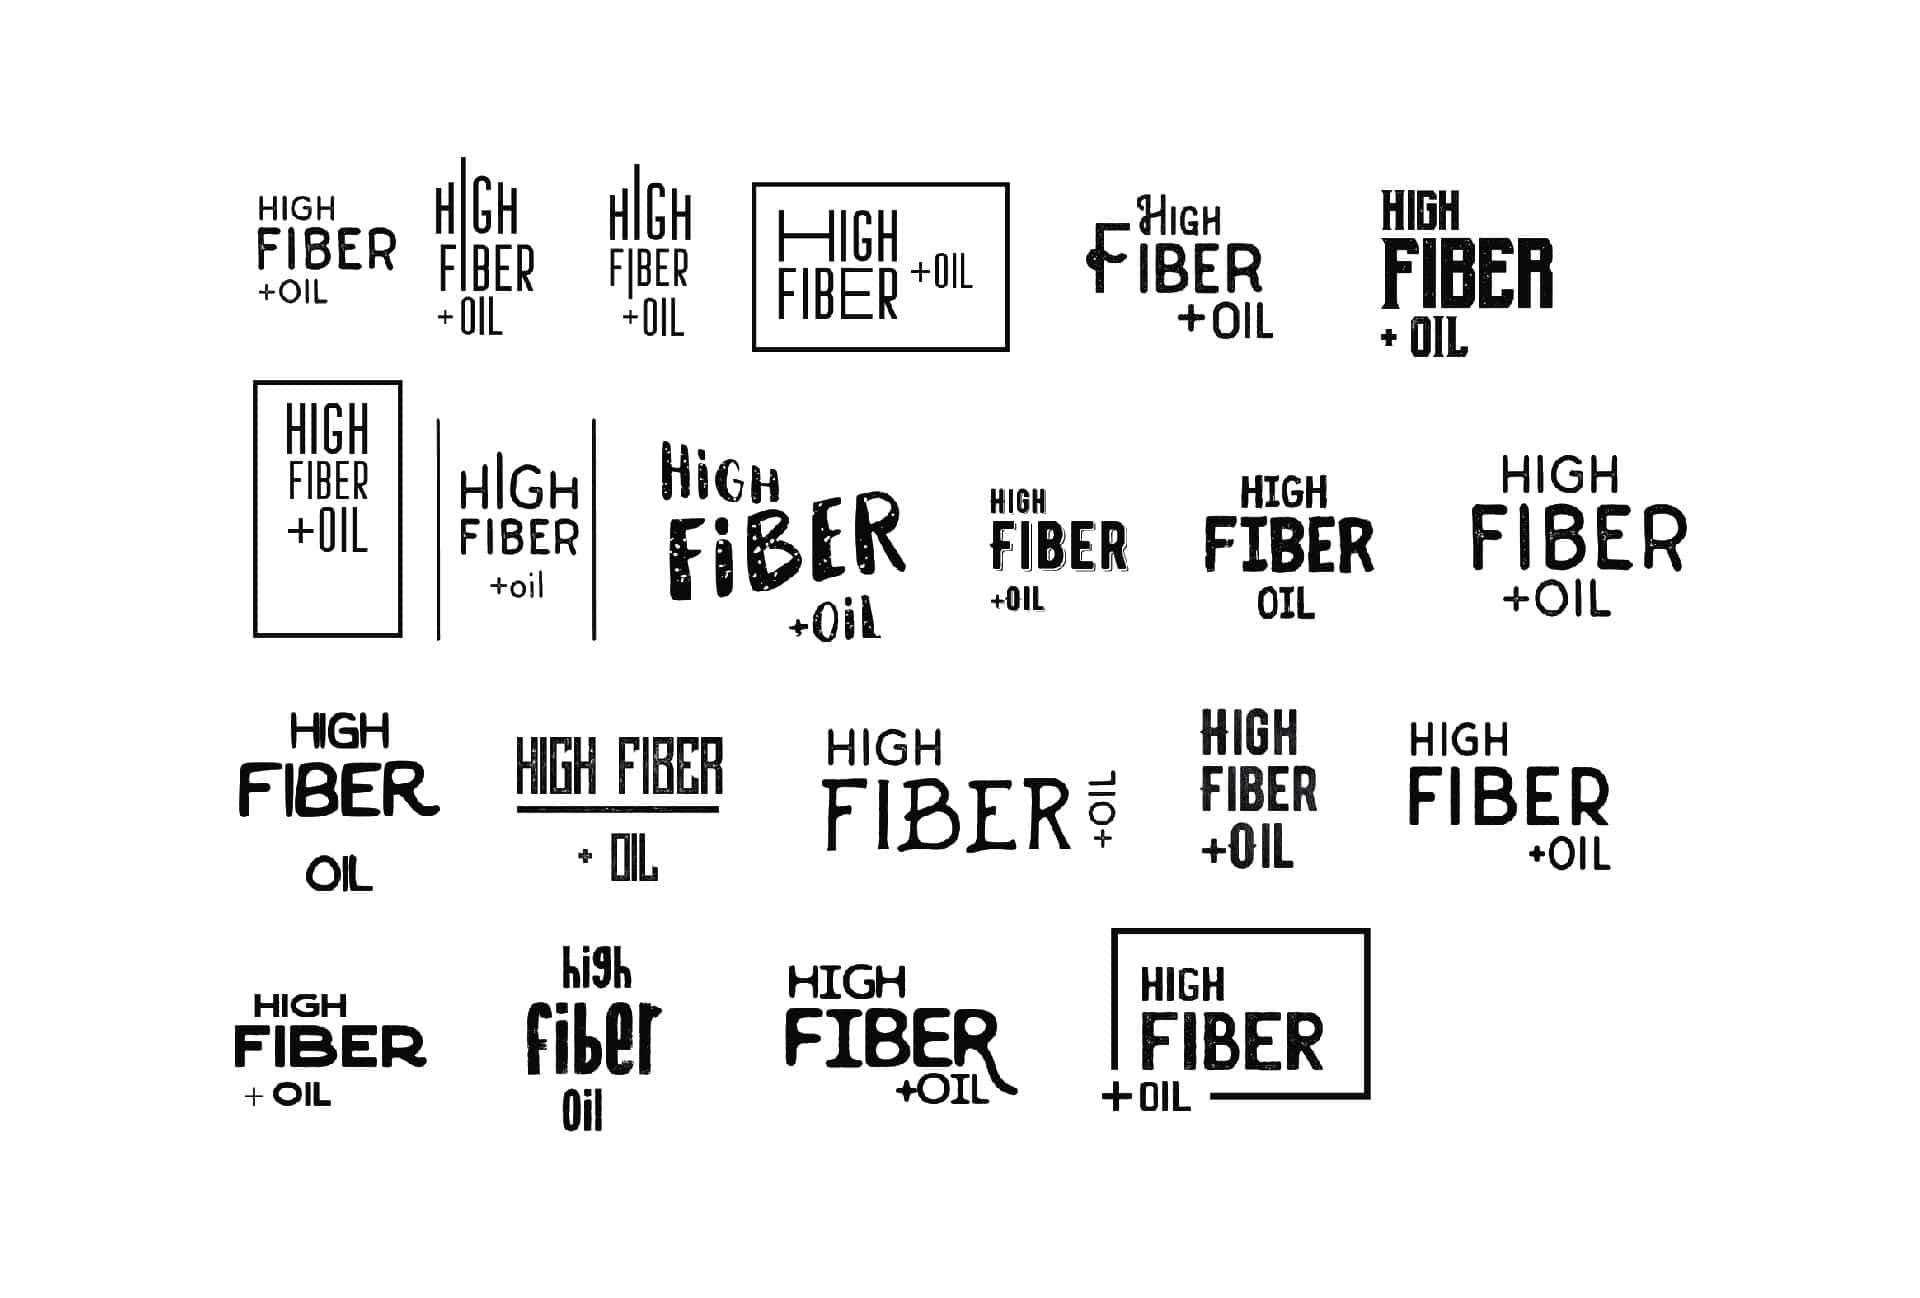 Logo search for l'High Fiber Food